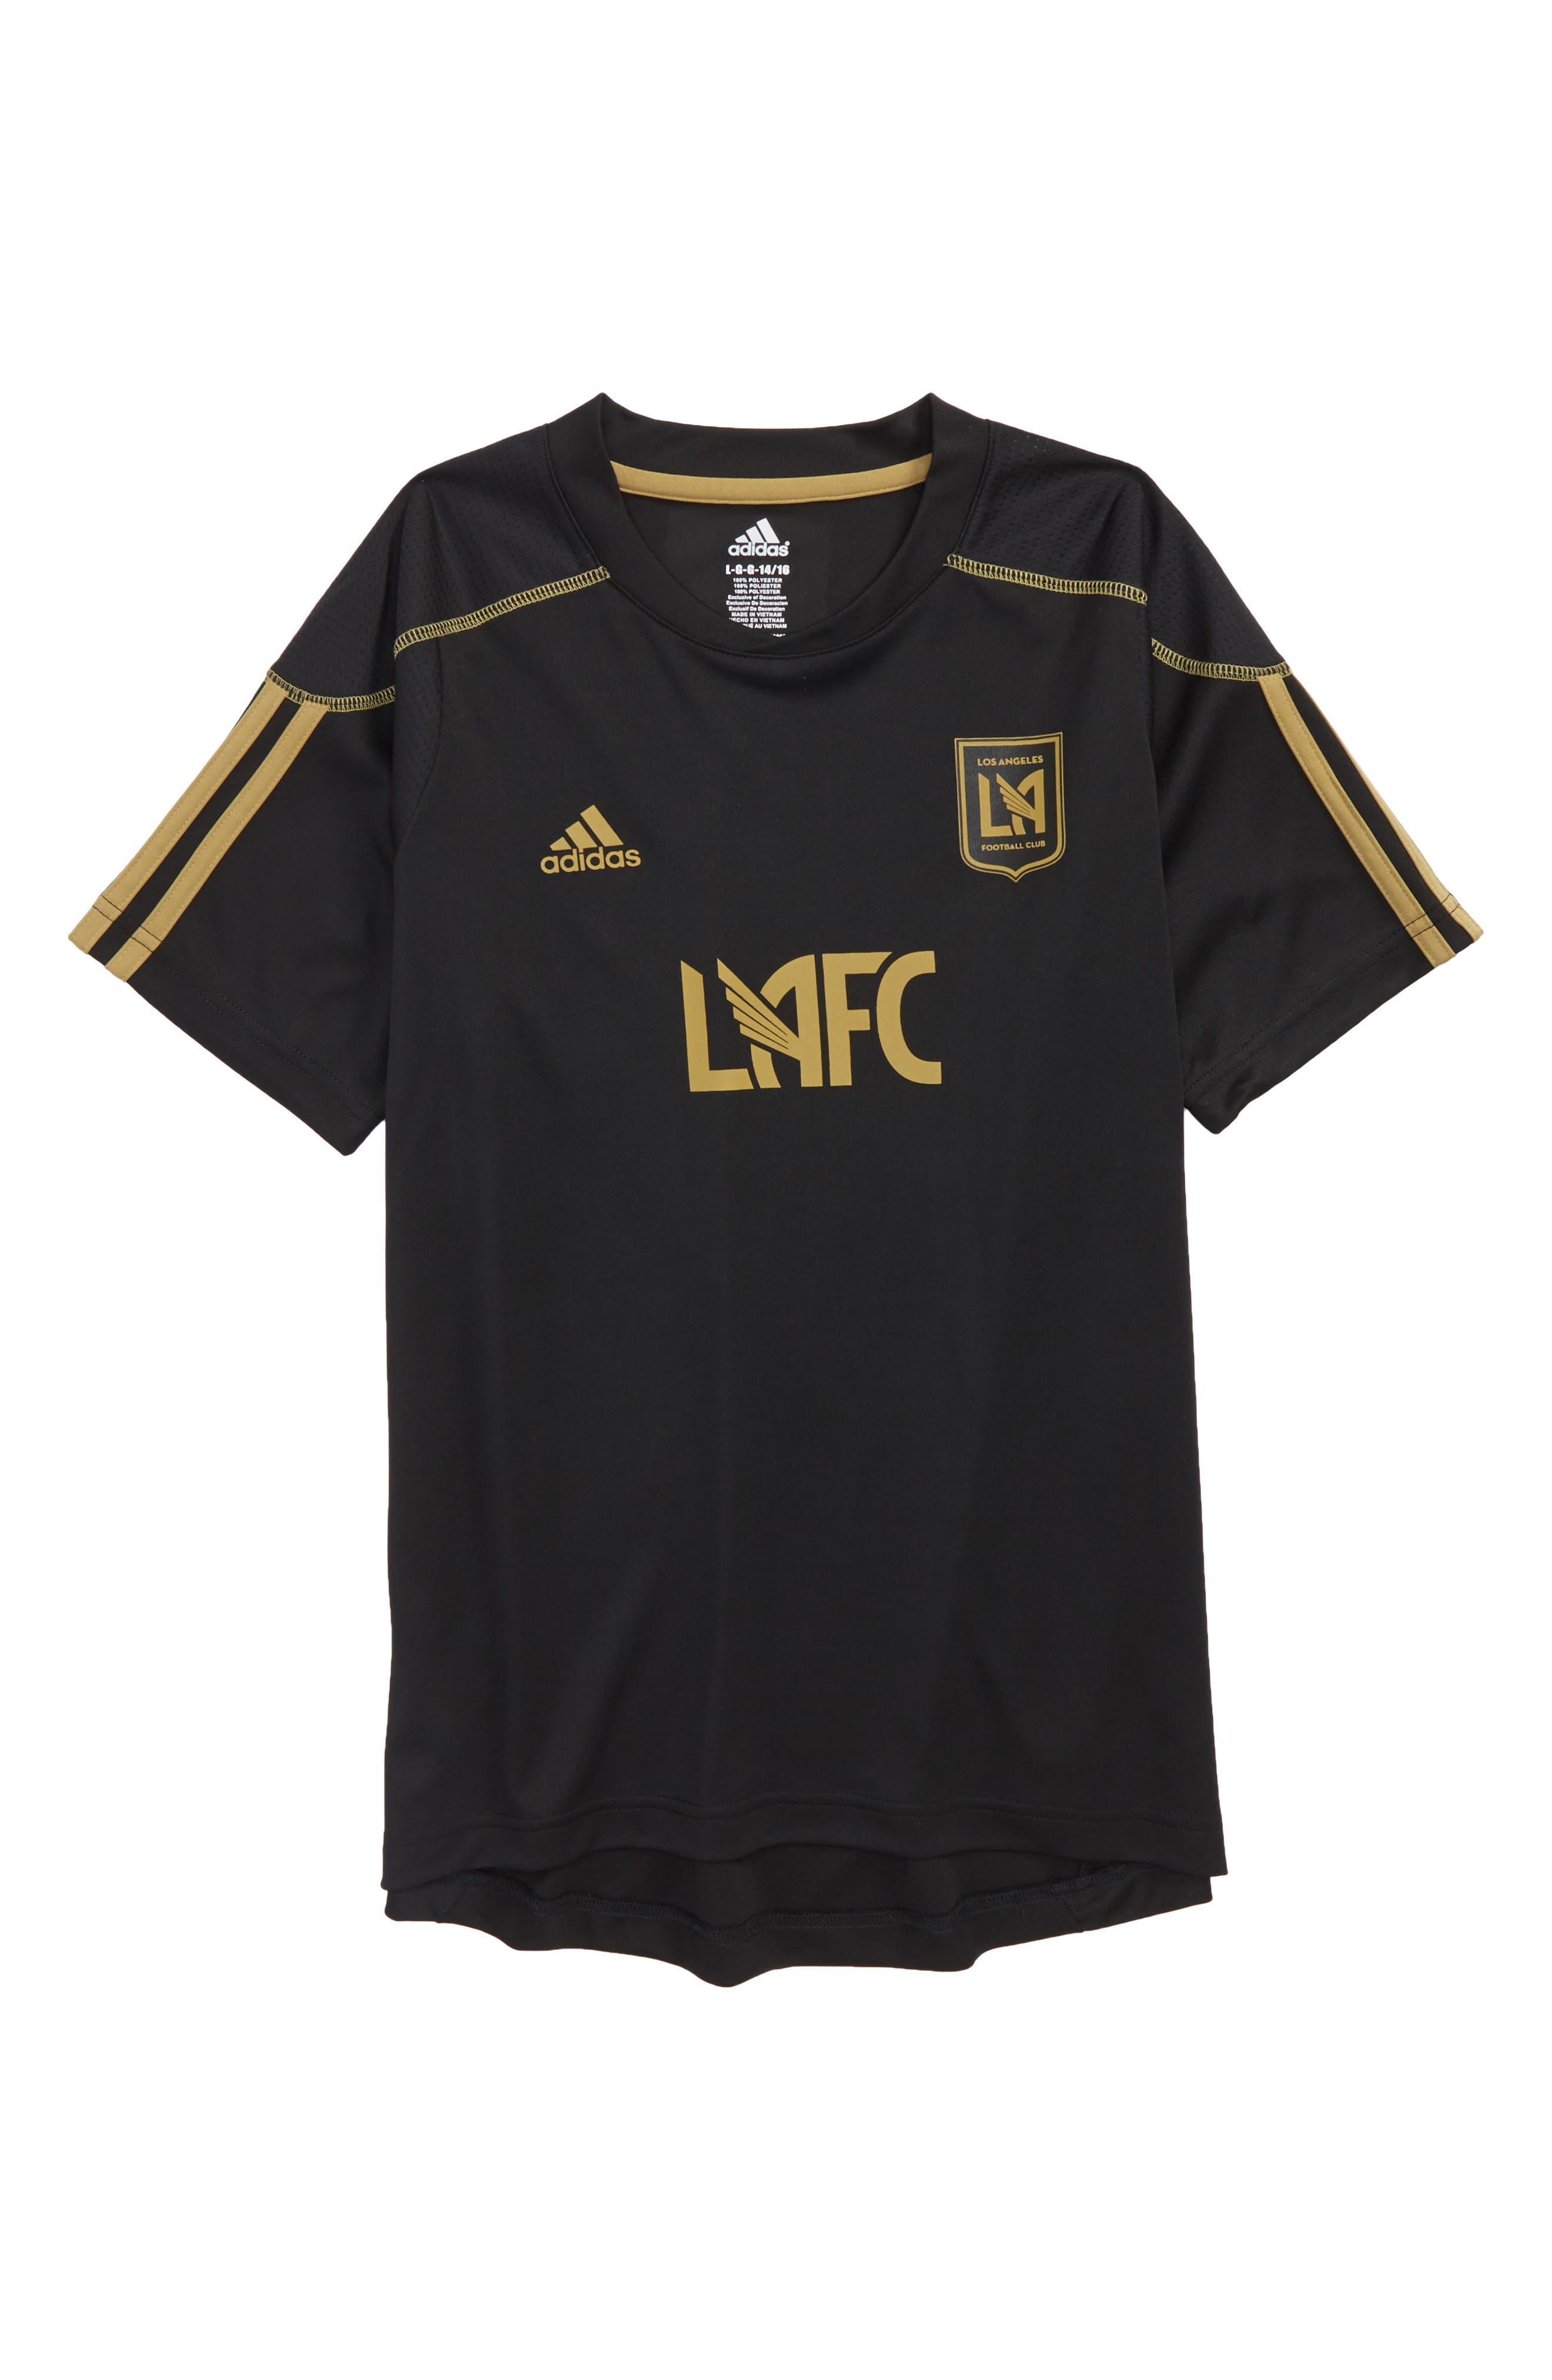 Main Image - adidas MLS Los Angeles FC Primary Logo Graphic T-Shirt (Big Boys)